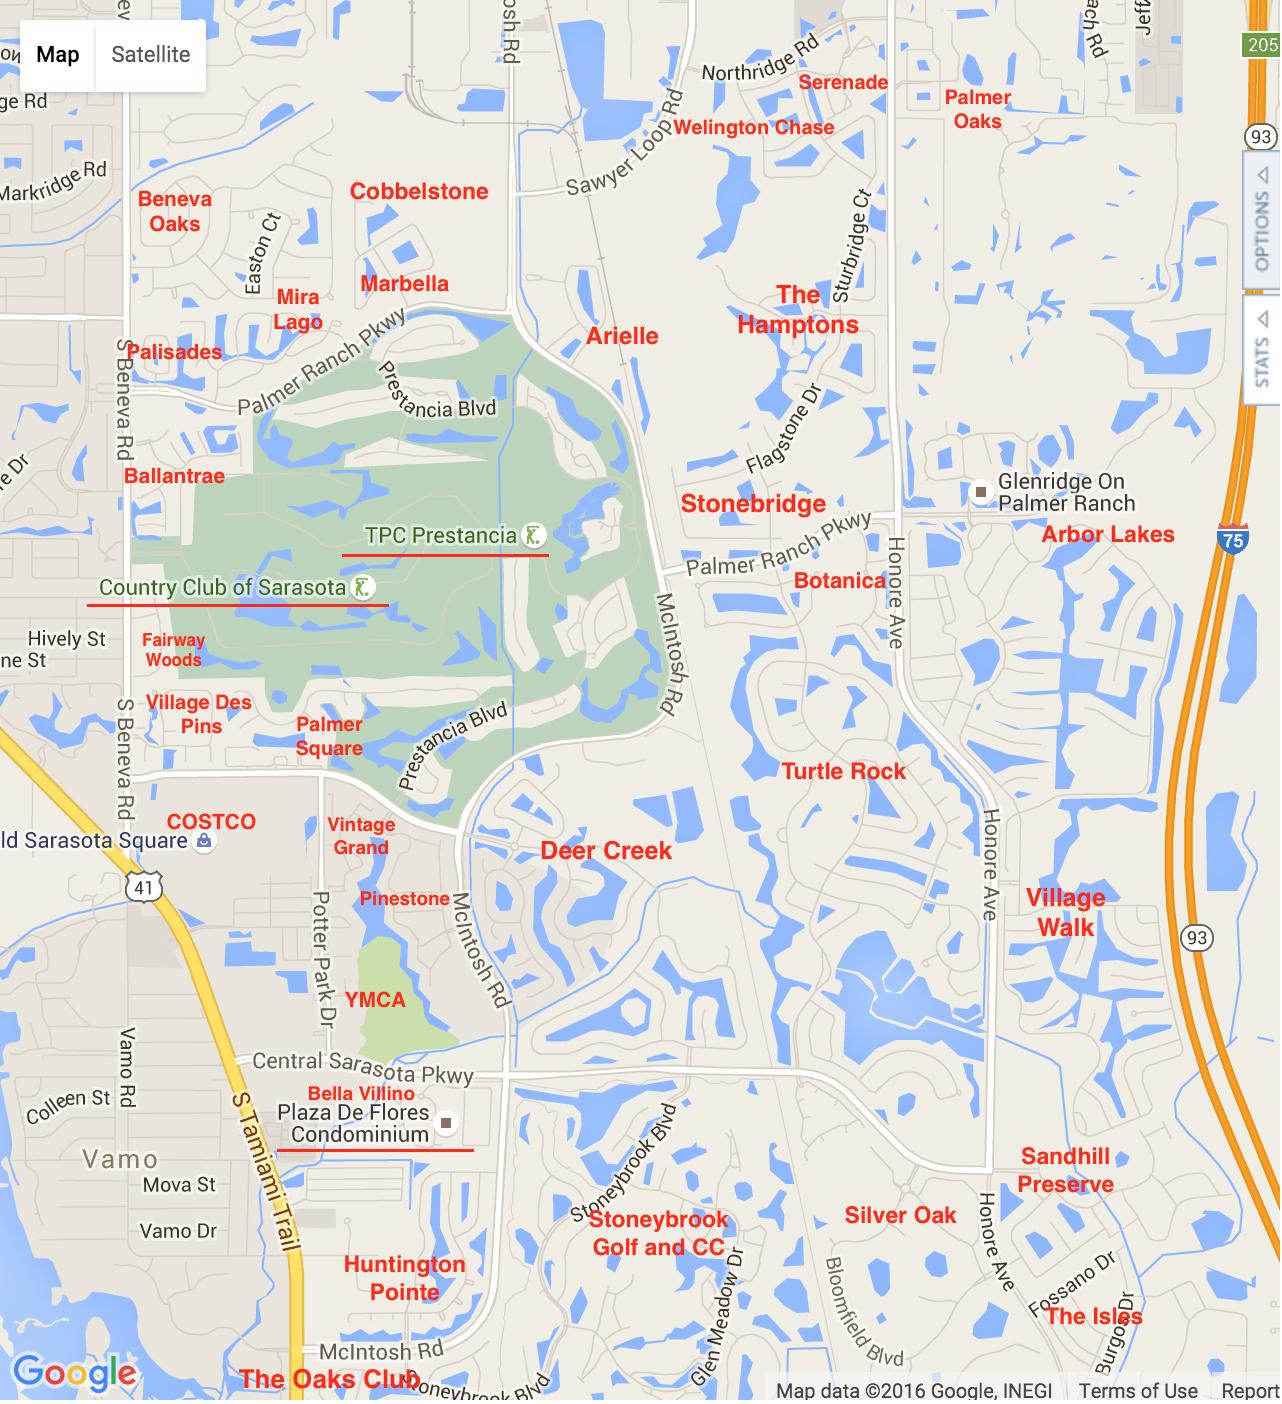 Palmer Ranch Map | Palmer Ranch Neighborhoods - Map Of The Villages Florida Neighborhoods